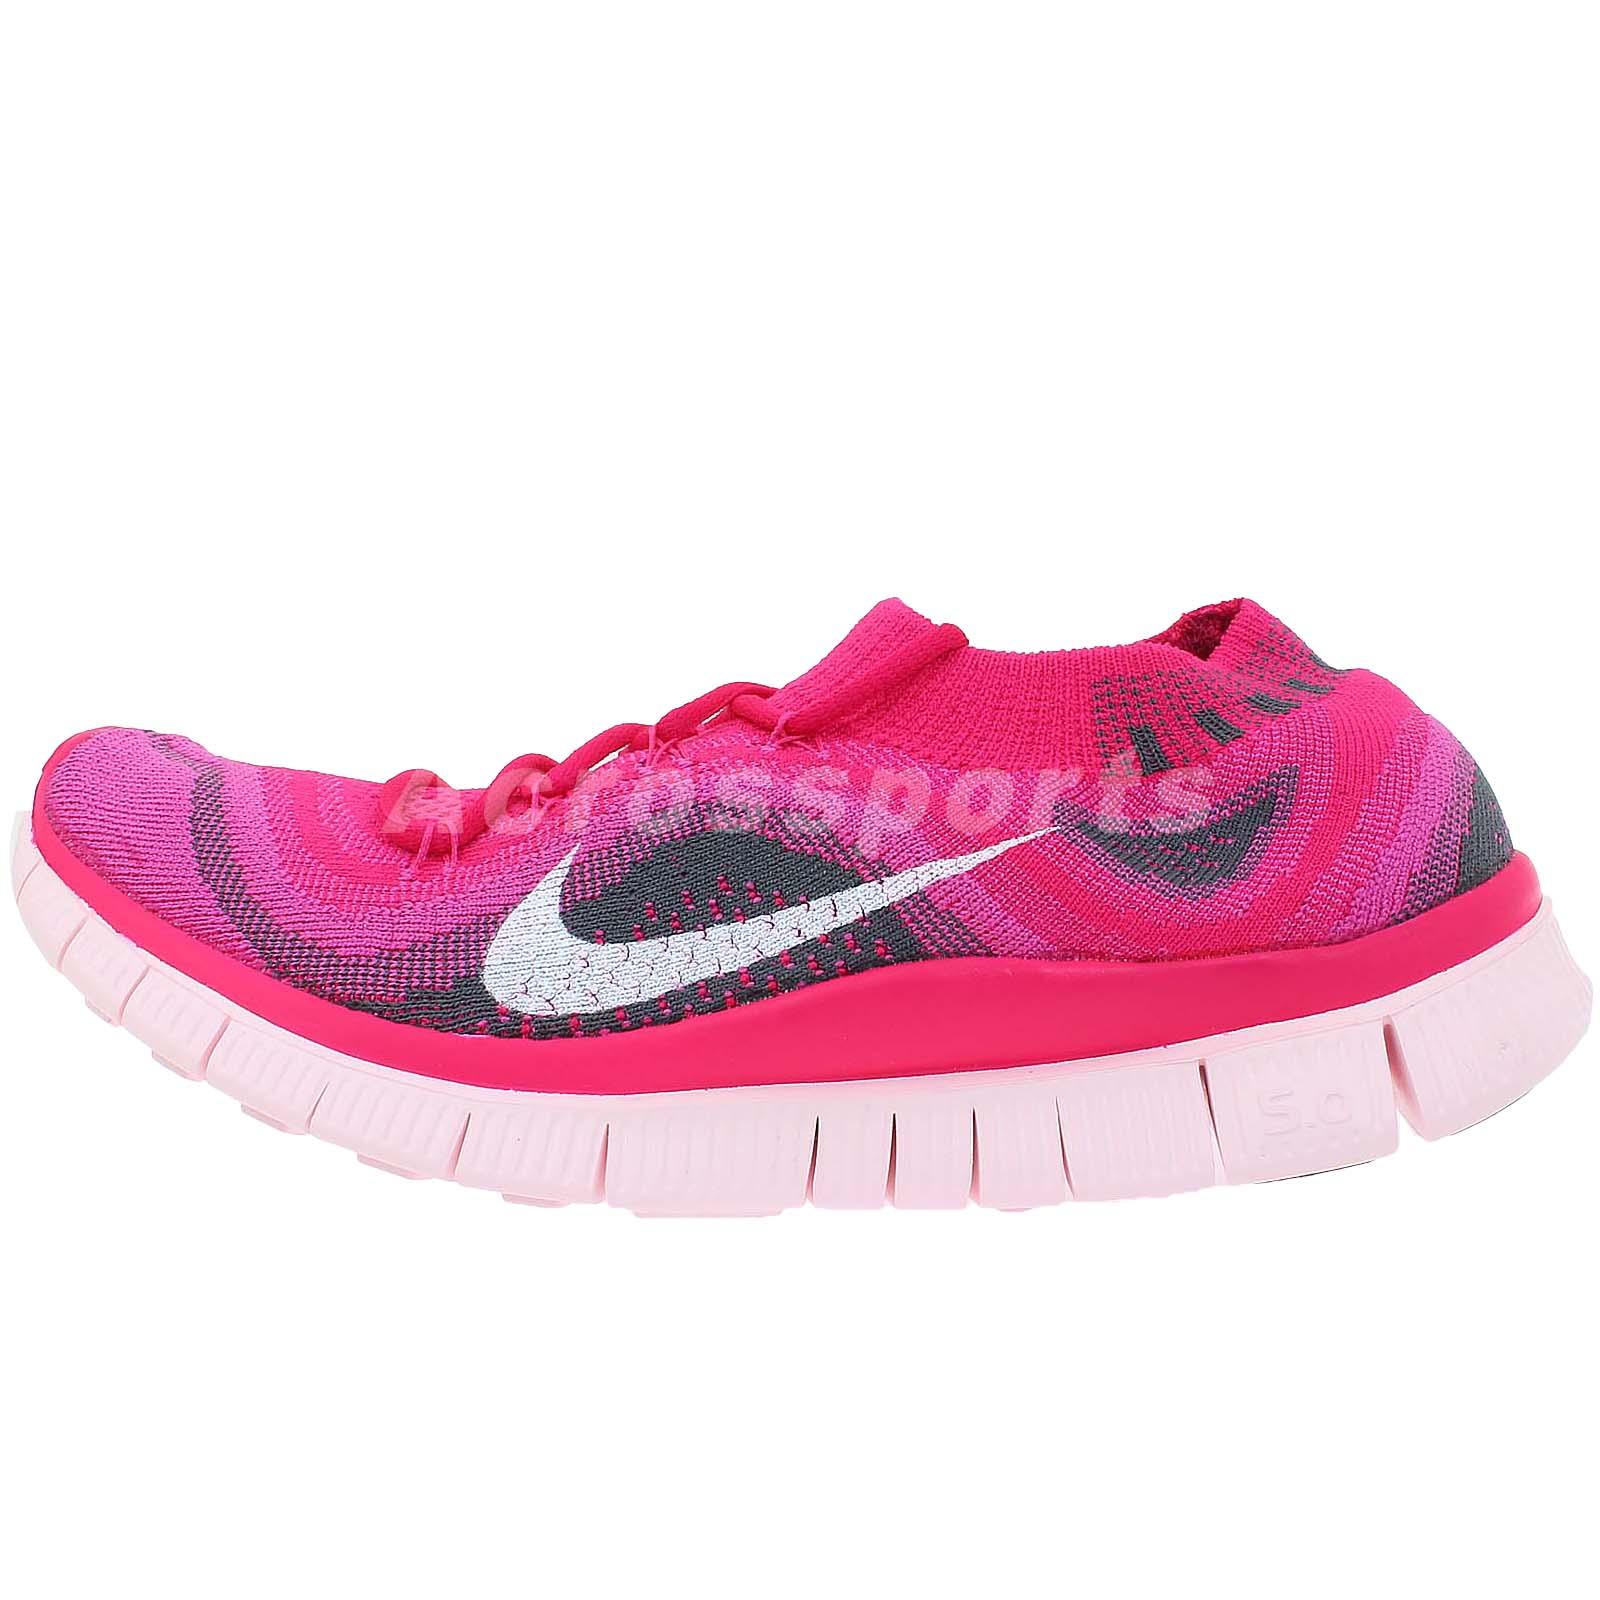 Wonderful Nike Flex Run Lightweight Running Shoe  Womens  DSW